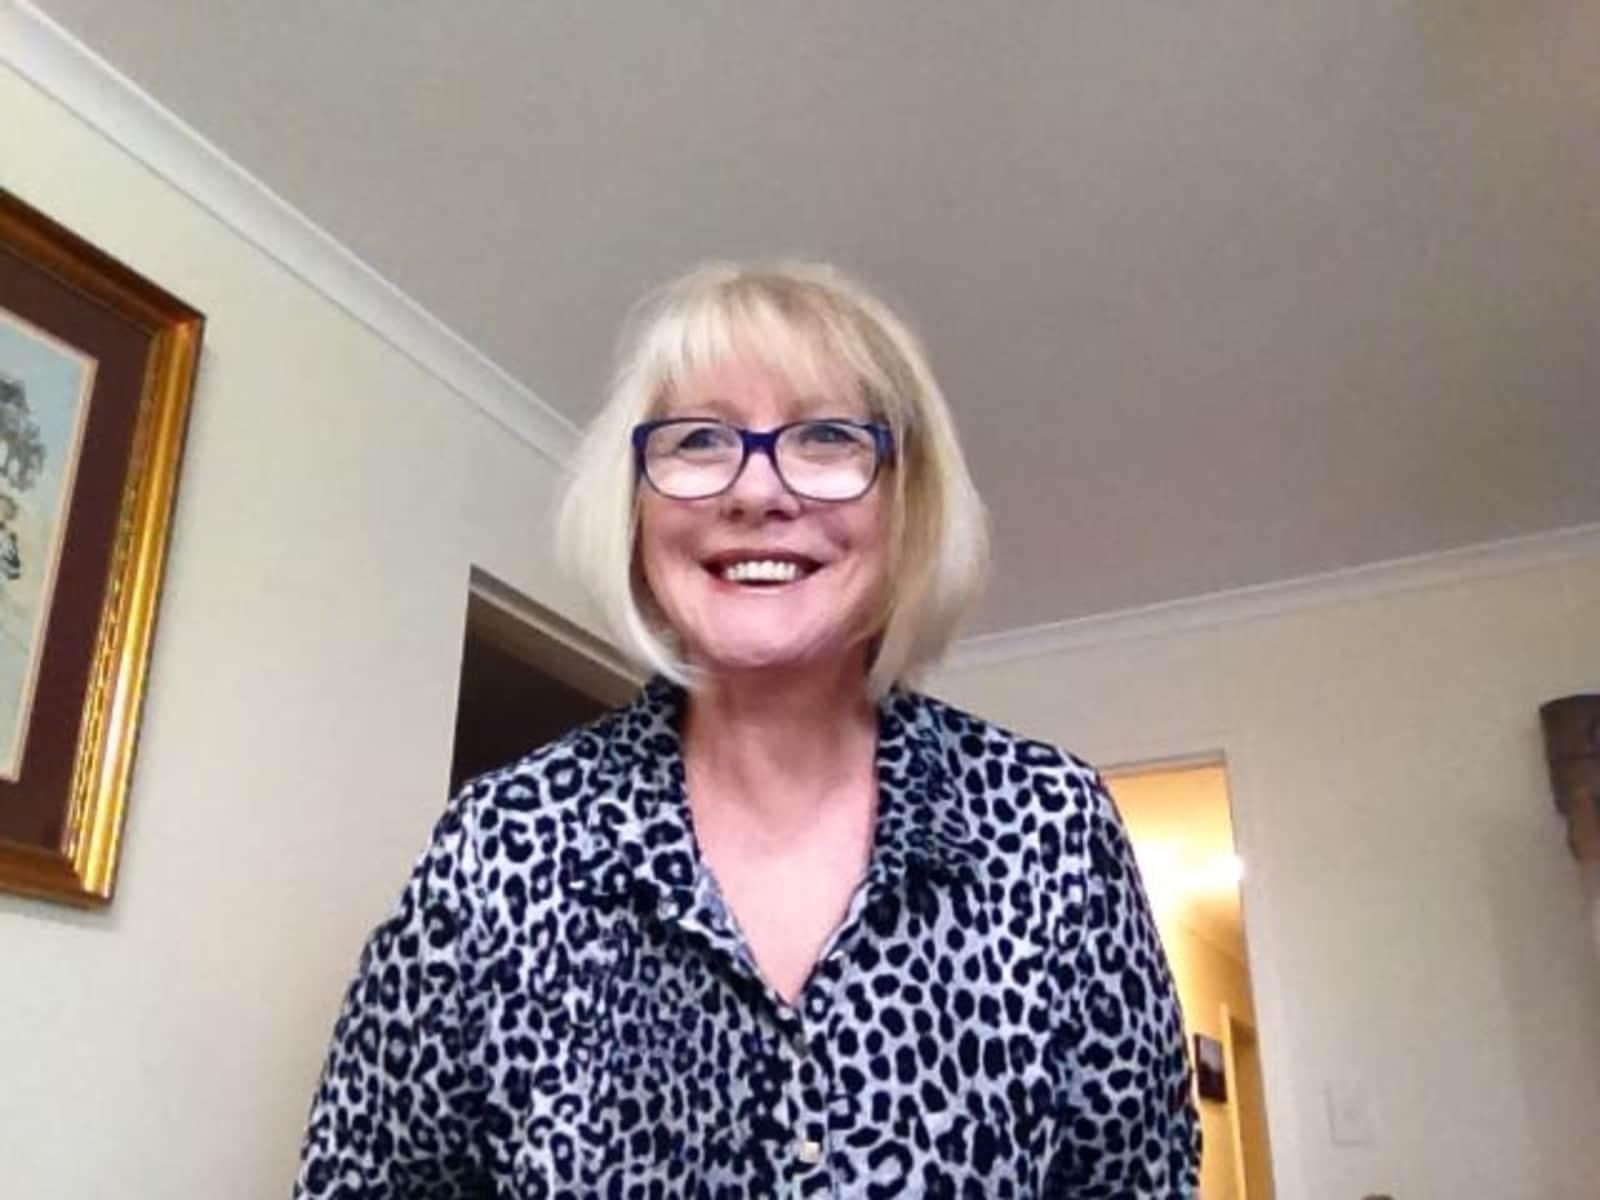 Robyn from Laverton, Western Australia, Australia